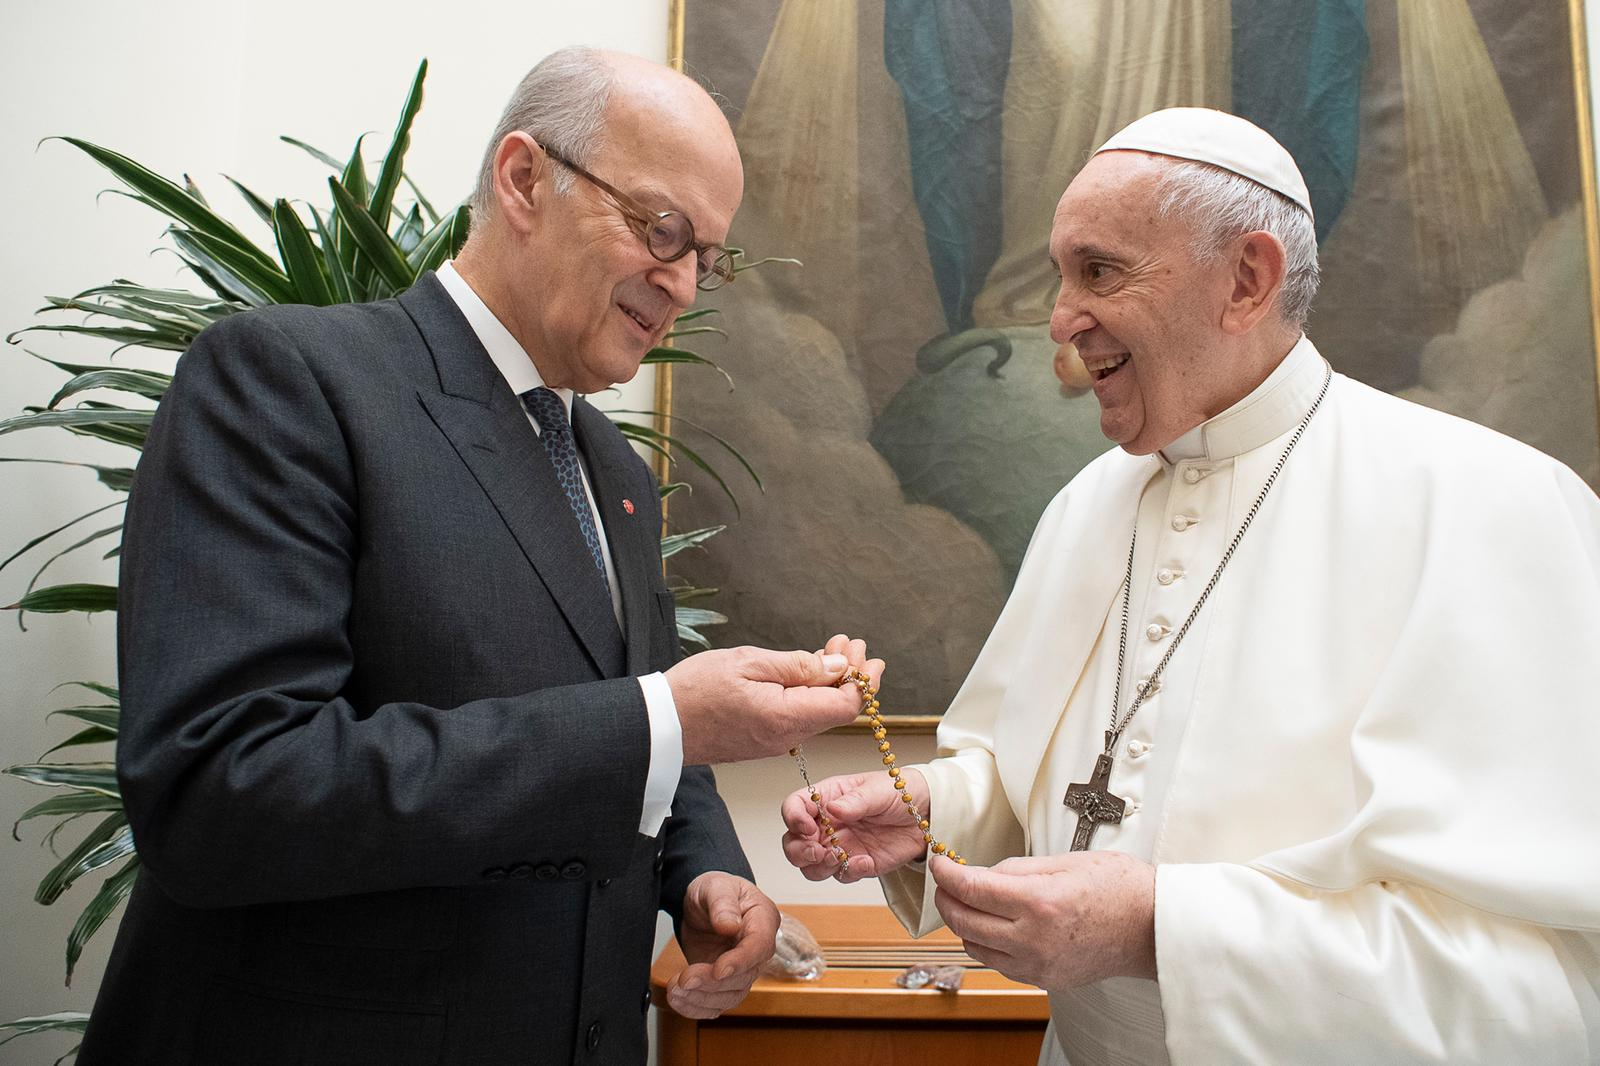 Thomas Heine-Geldern, Executive President ACN (International) shows Pope Francis one of the rosaries made in Bethlehem (© Servizio Fotografico - Vatican Media).